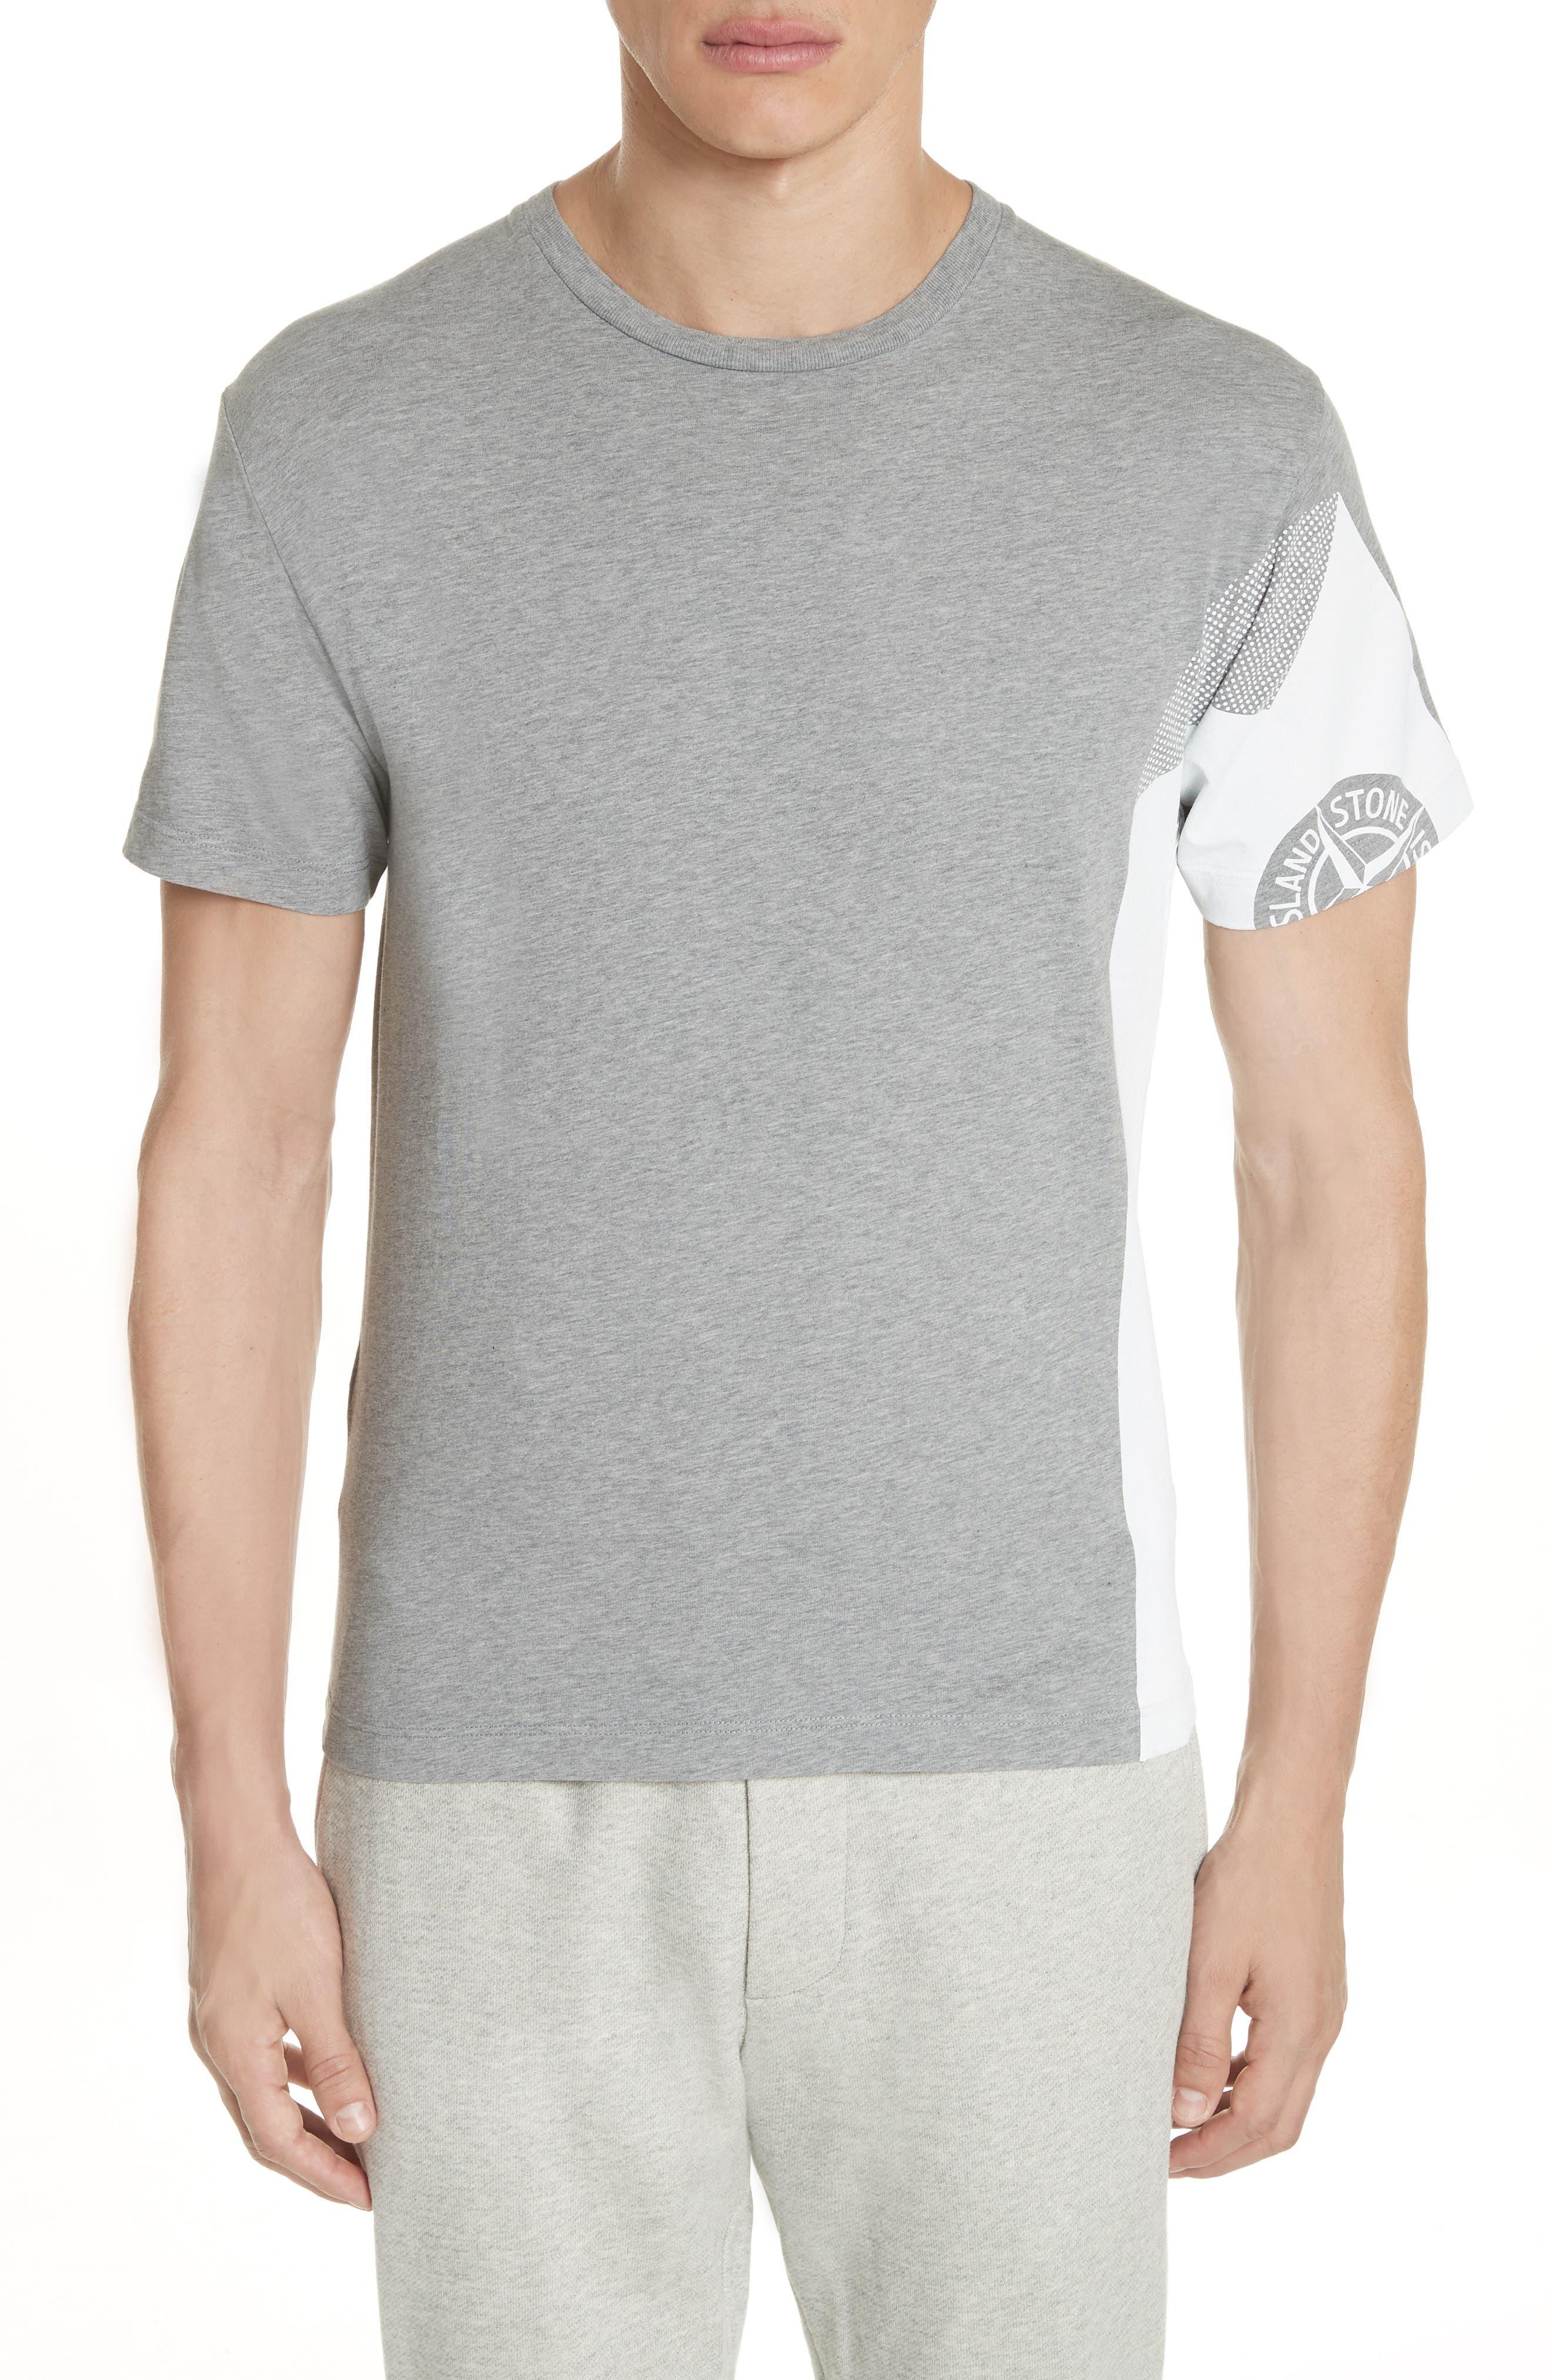 Alternate Image 1 Selected - Stone Island Graphic T-Shirt